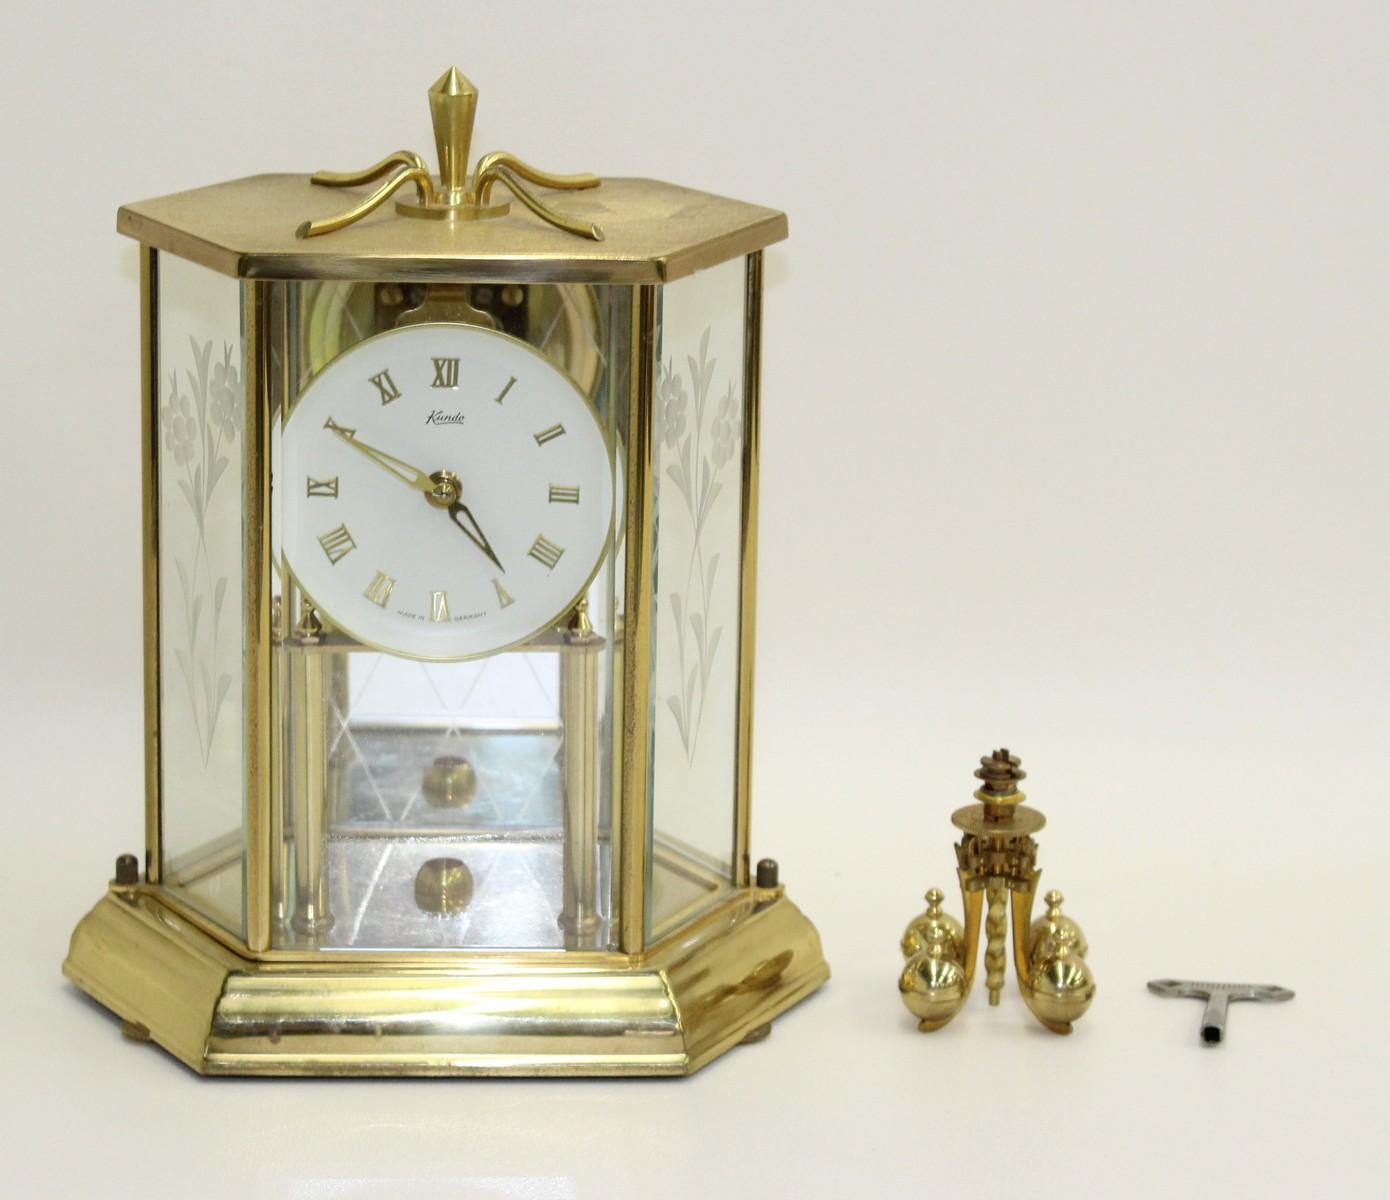 FAULTY KUNDO 400 Day Four Ball Pendulum Anniversary Mantelpiece Clock Timepiece 2